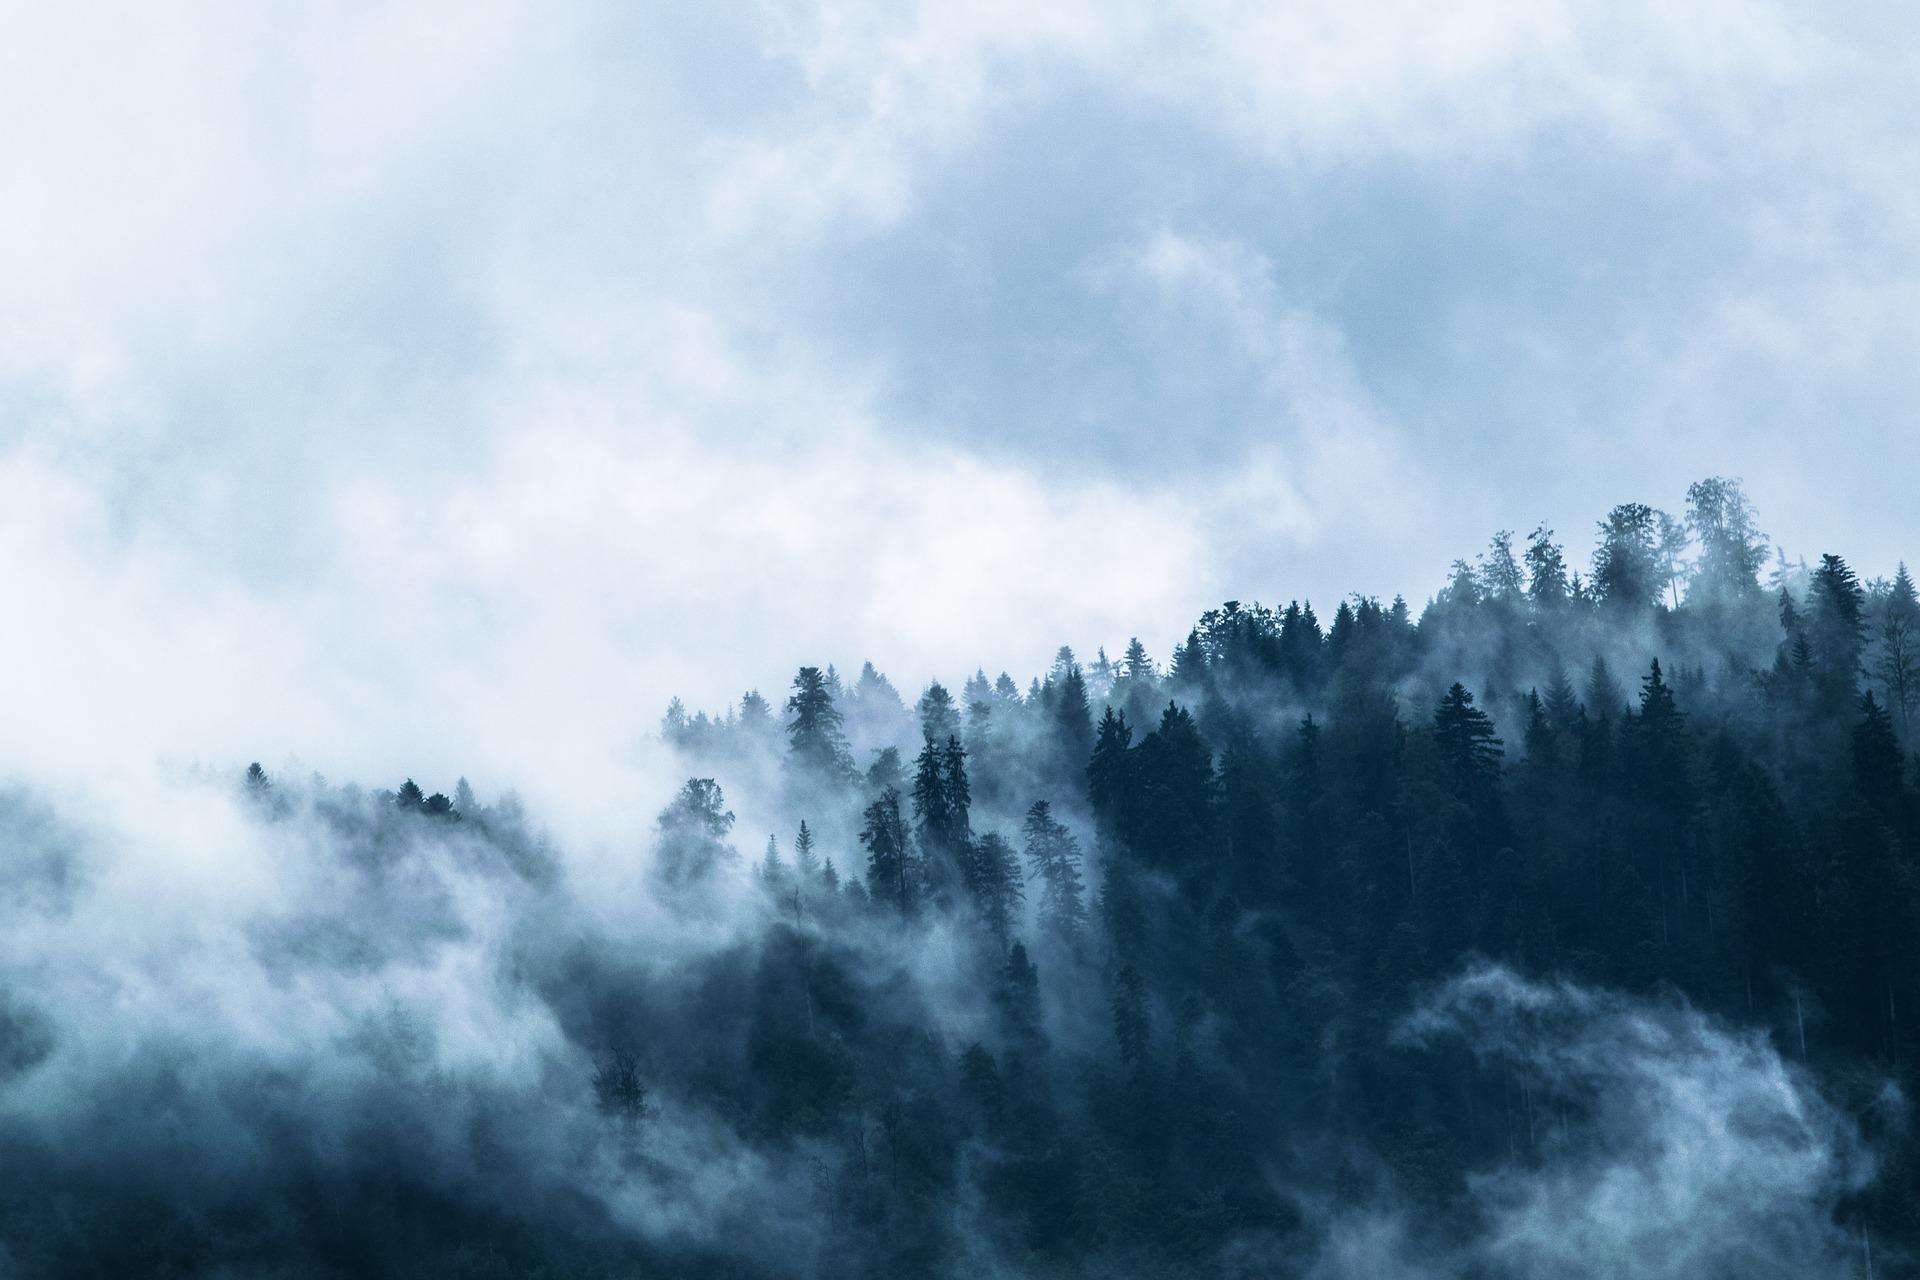 fog-1535201_1920.jpg